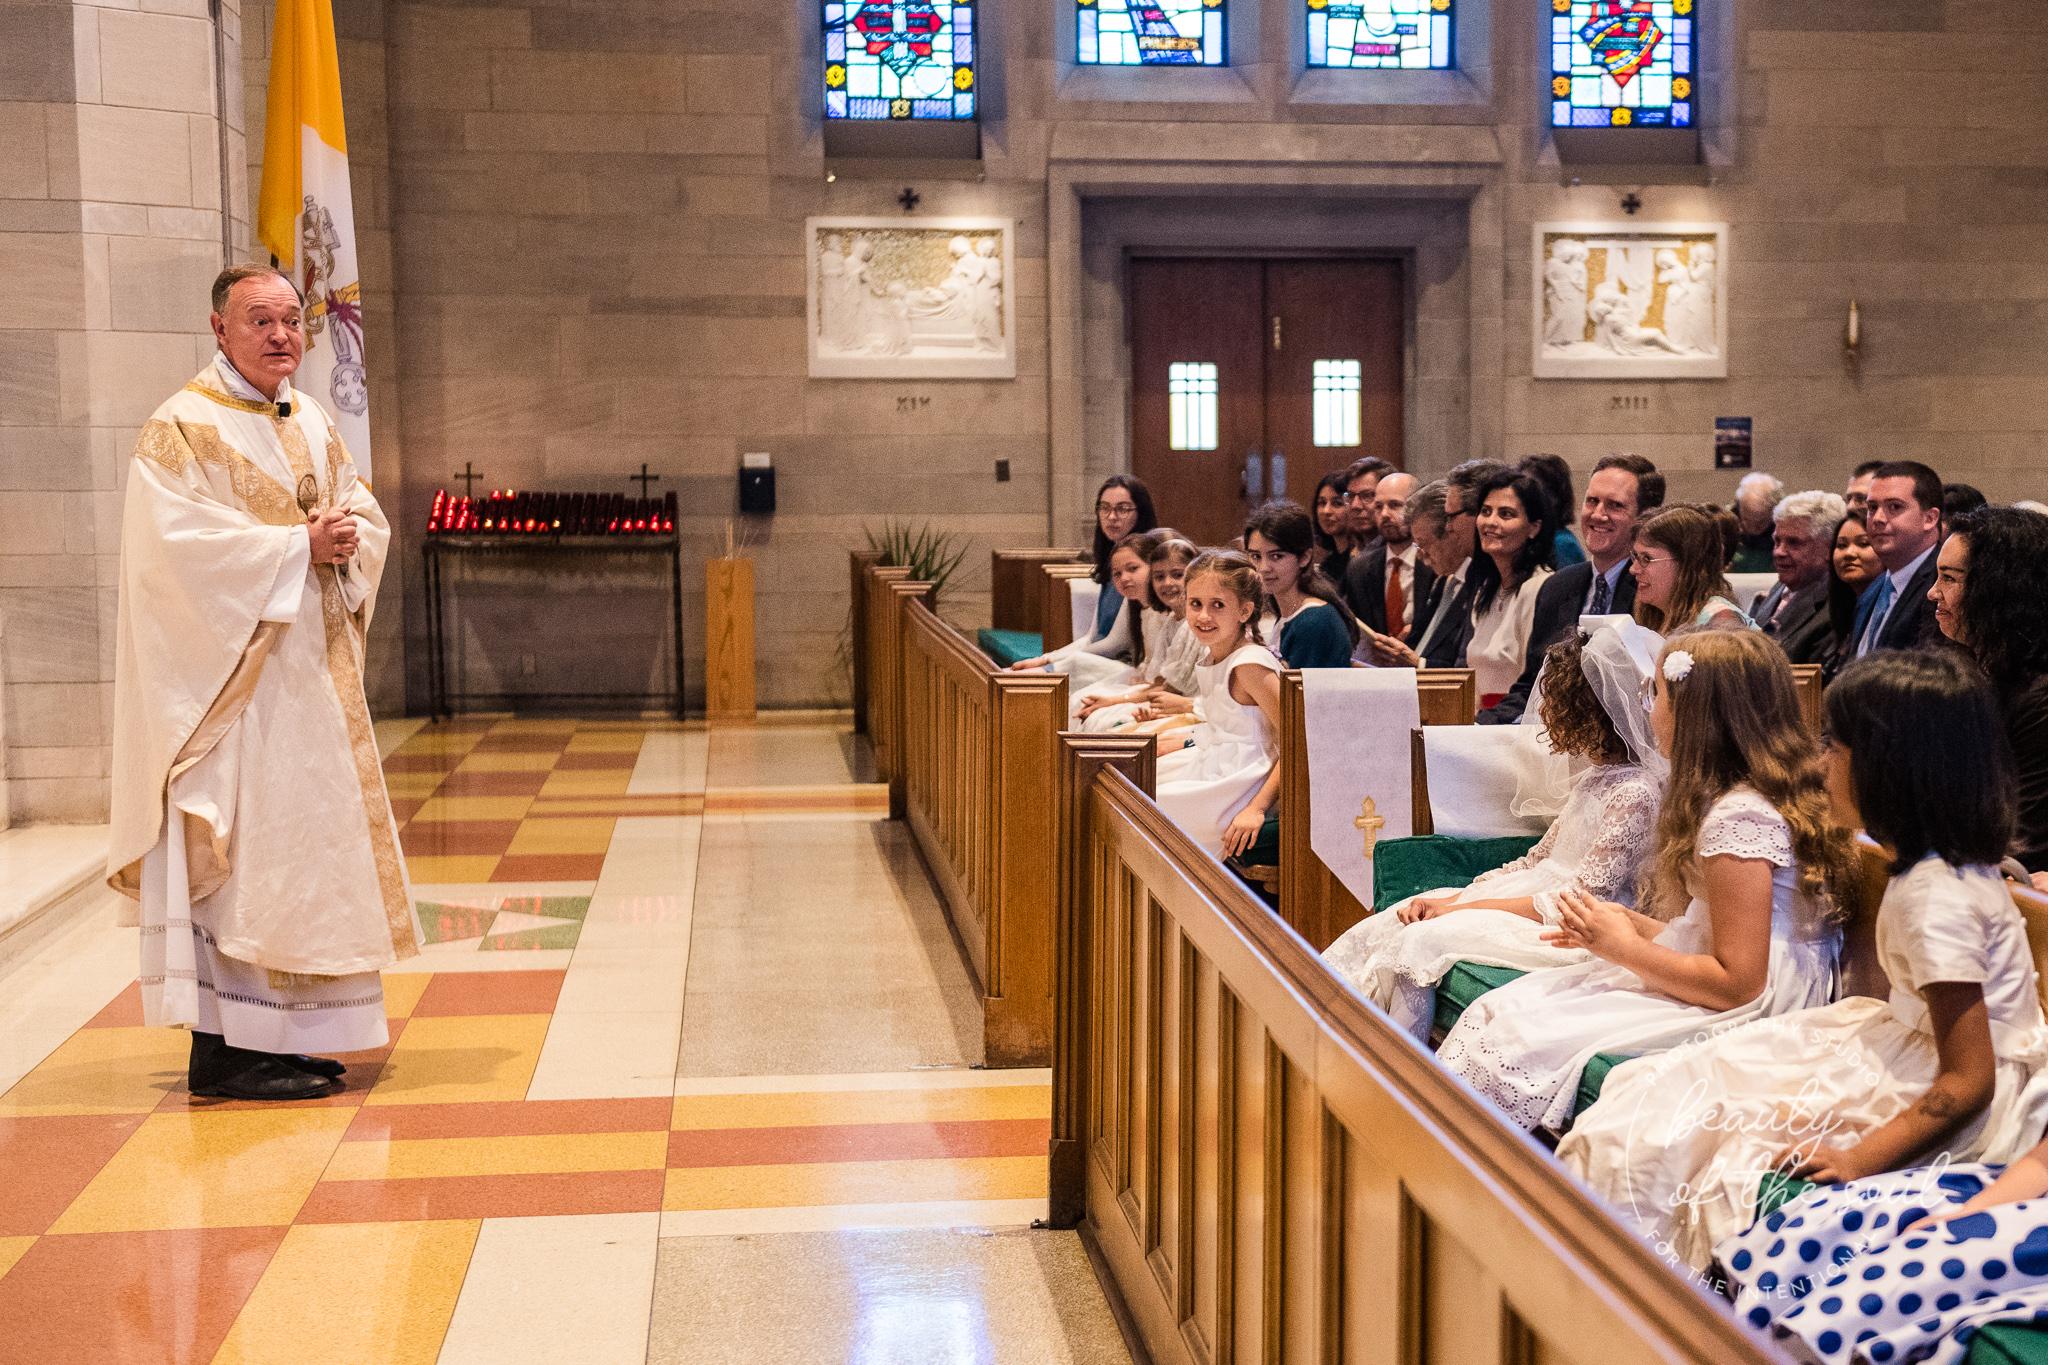 washington-dc-st-ann-catholic-church-first-holy-communion-beauty-of-the-soul-studio-may-2019-08.jpg